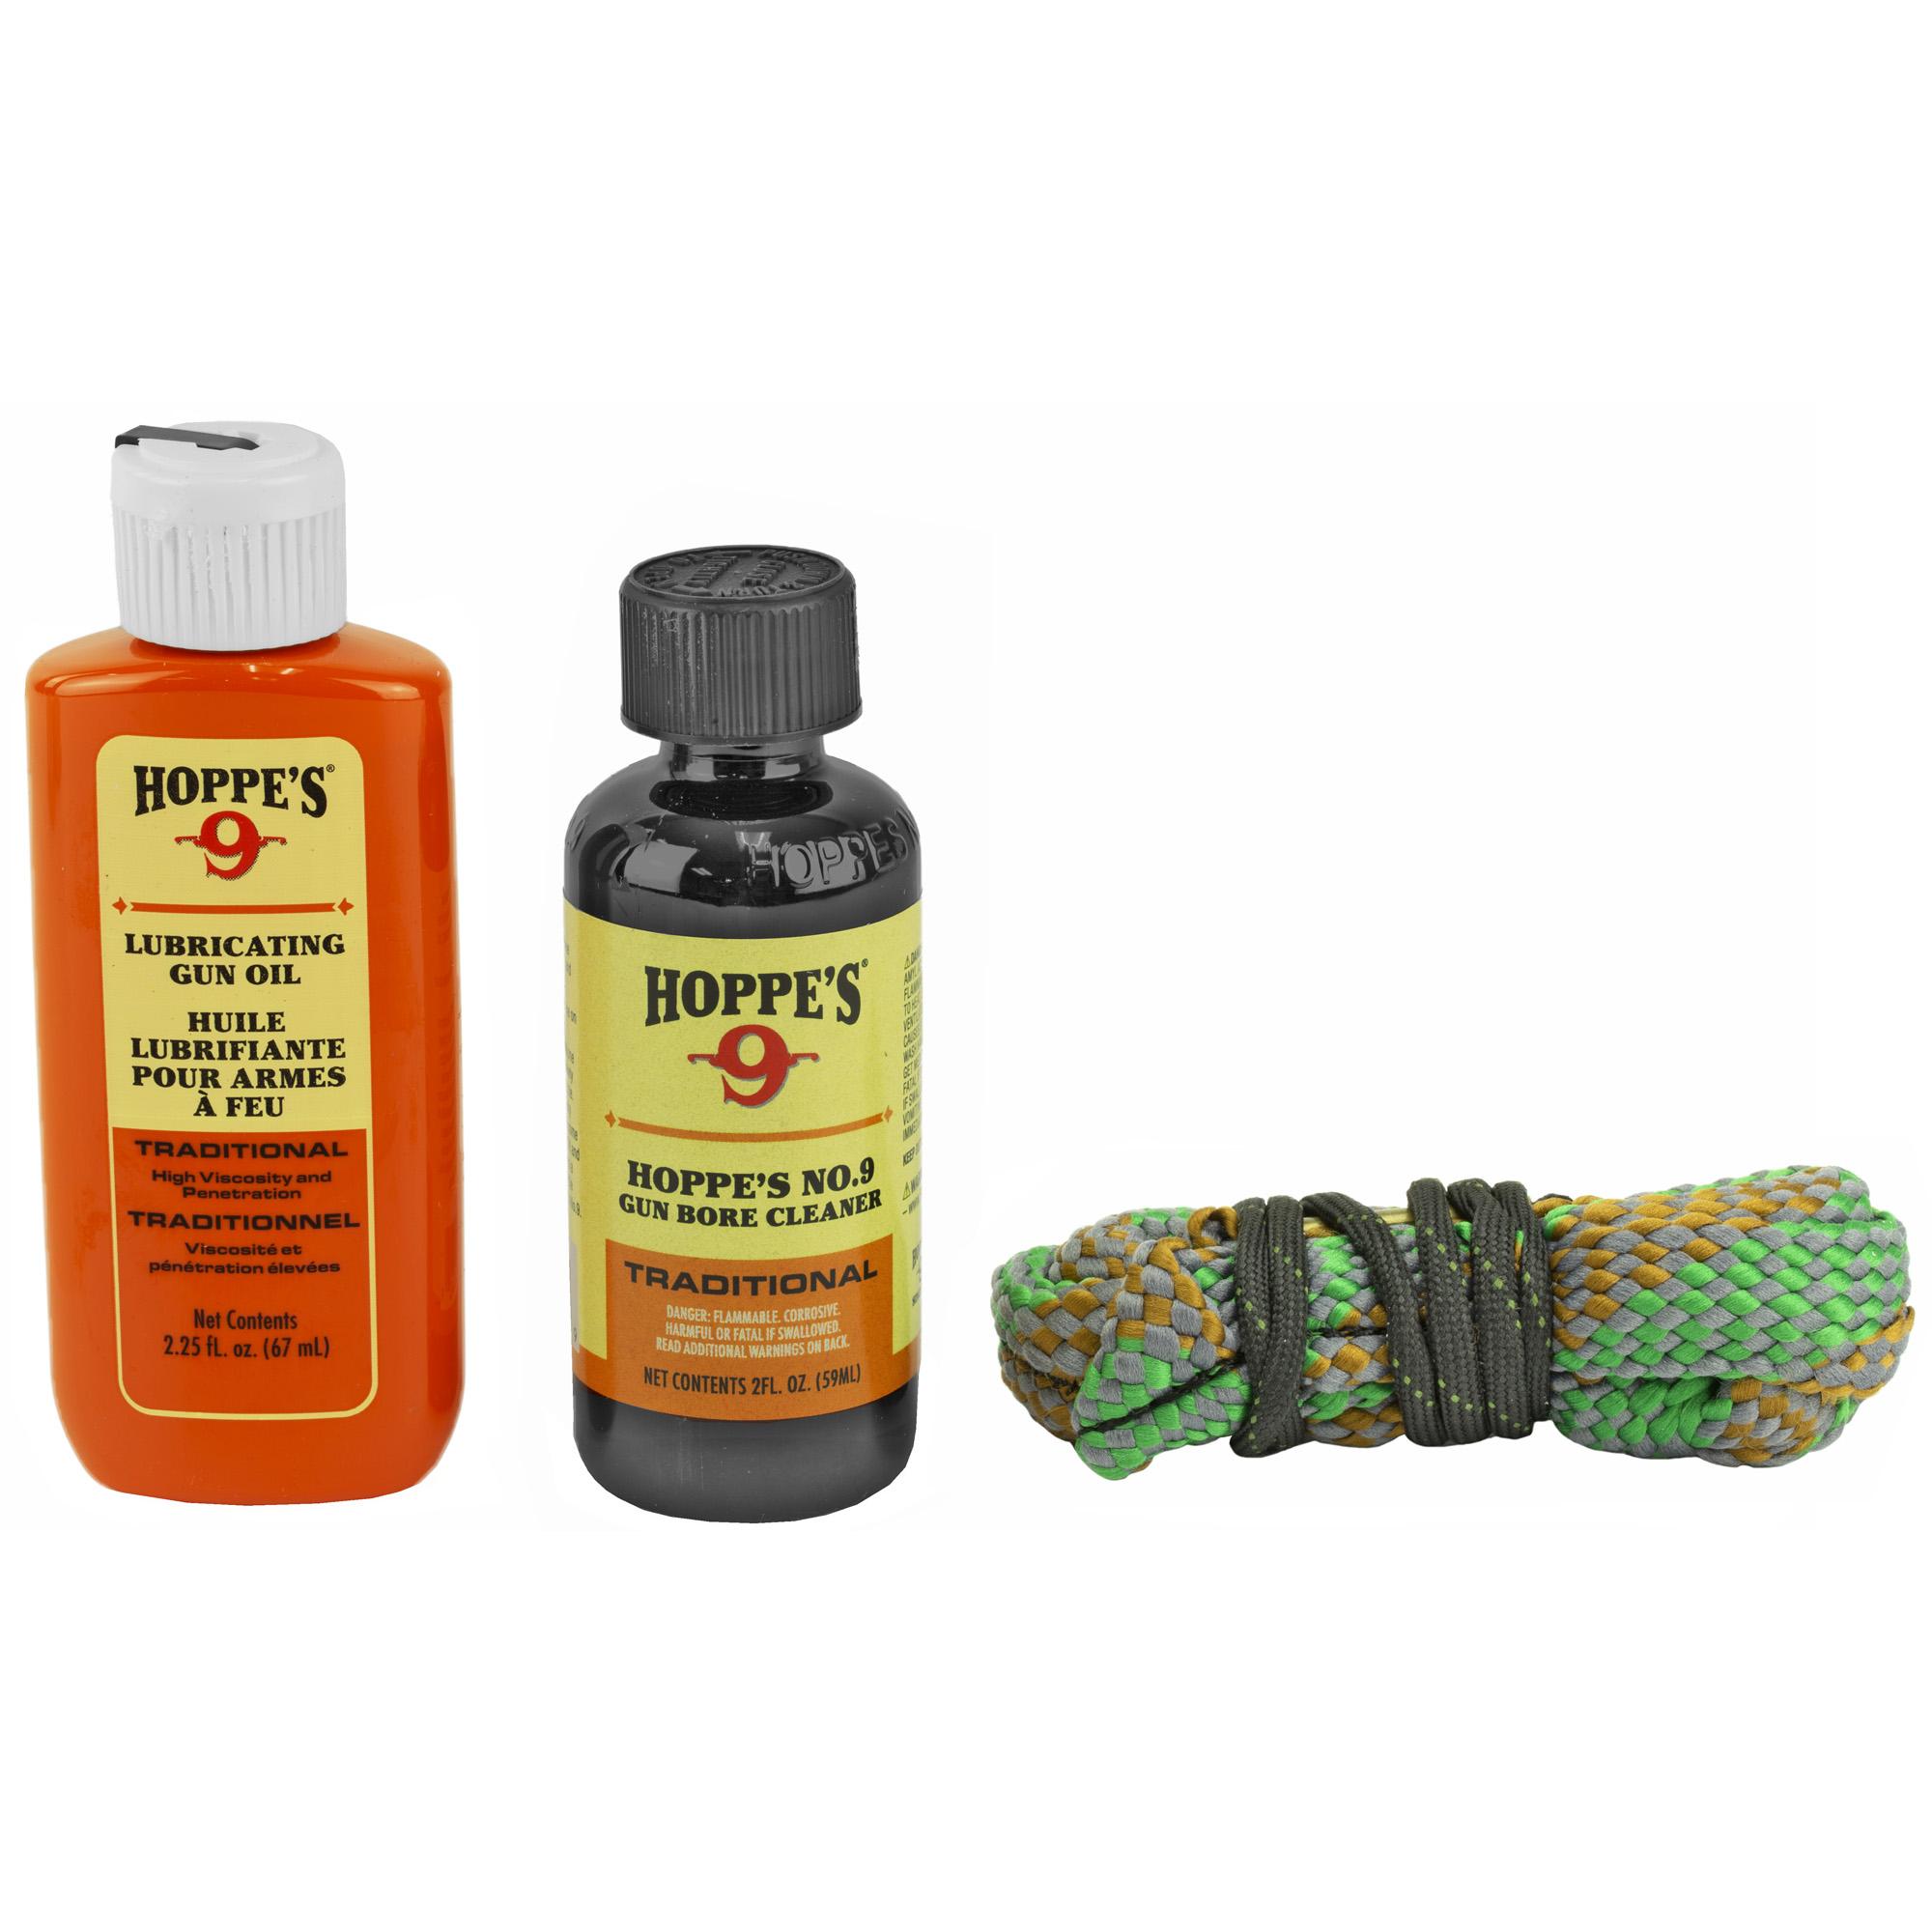 Hoppes 1 2 3 Done Pstl Kit 40cal